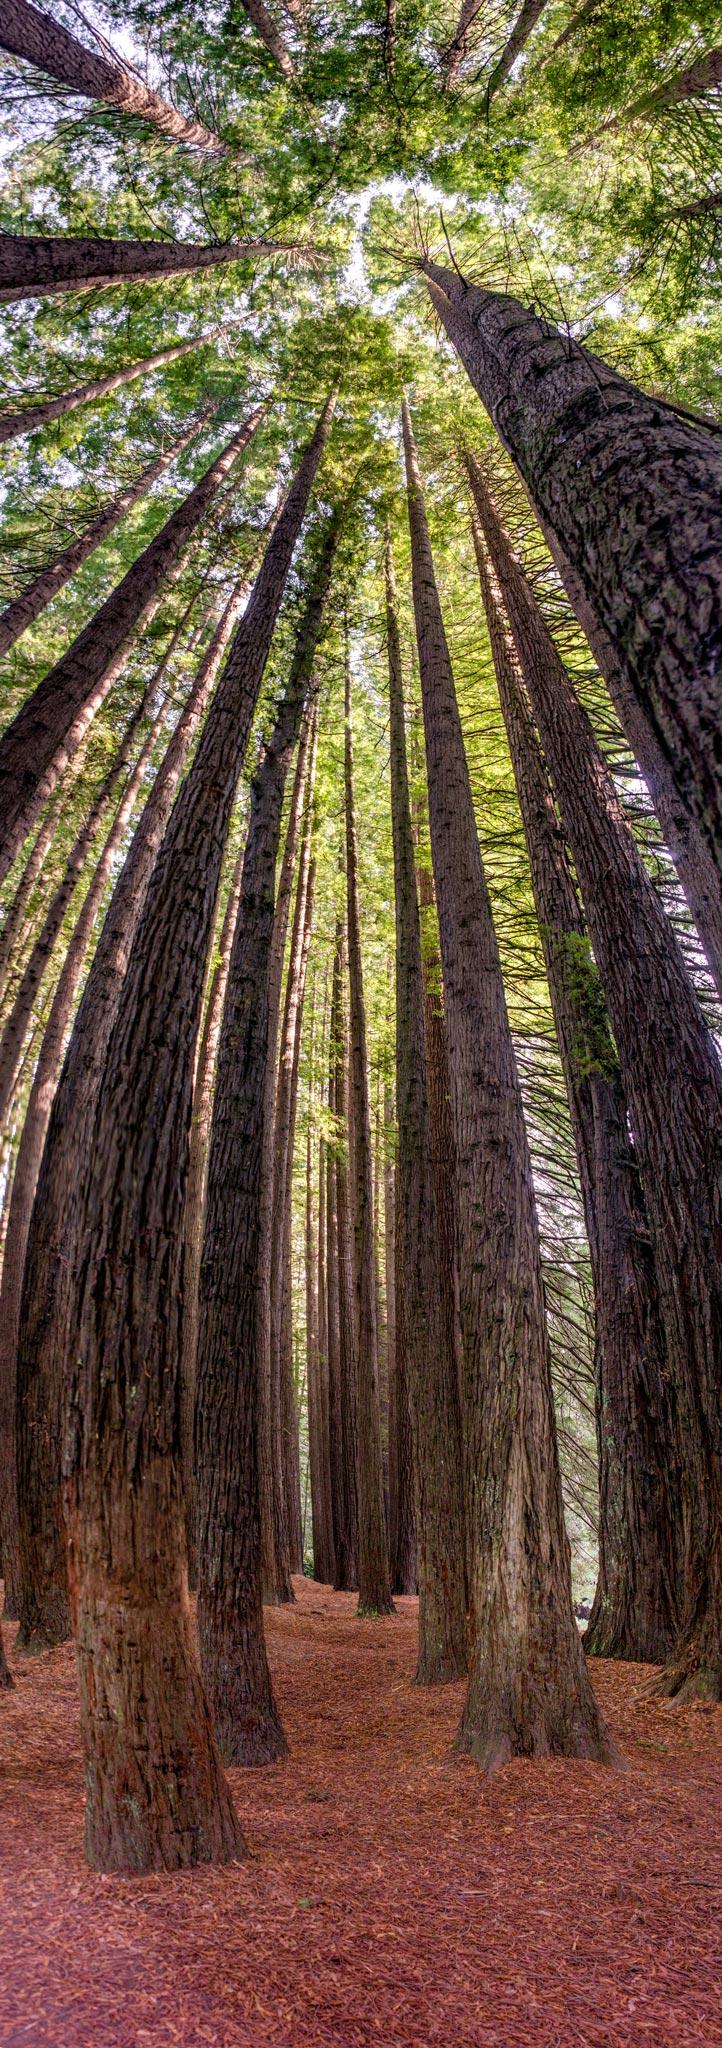 Paesaggi-Australia - Californian Redwood Forest - Australia-Californian_Redwood_Forest - Australia-Californian_Redwood_Forest